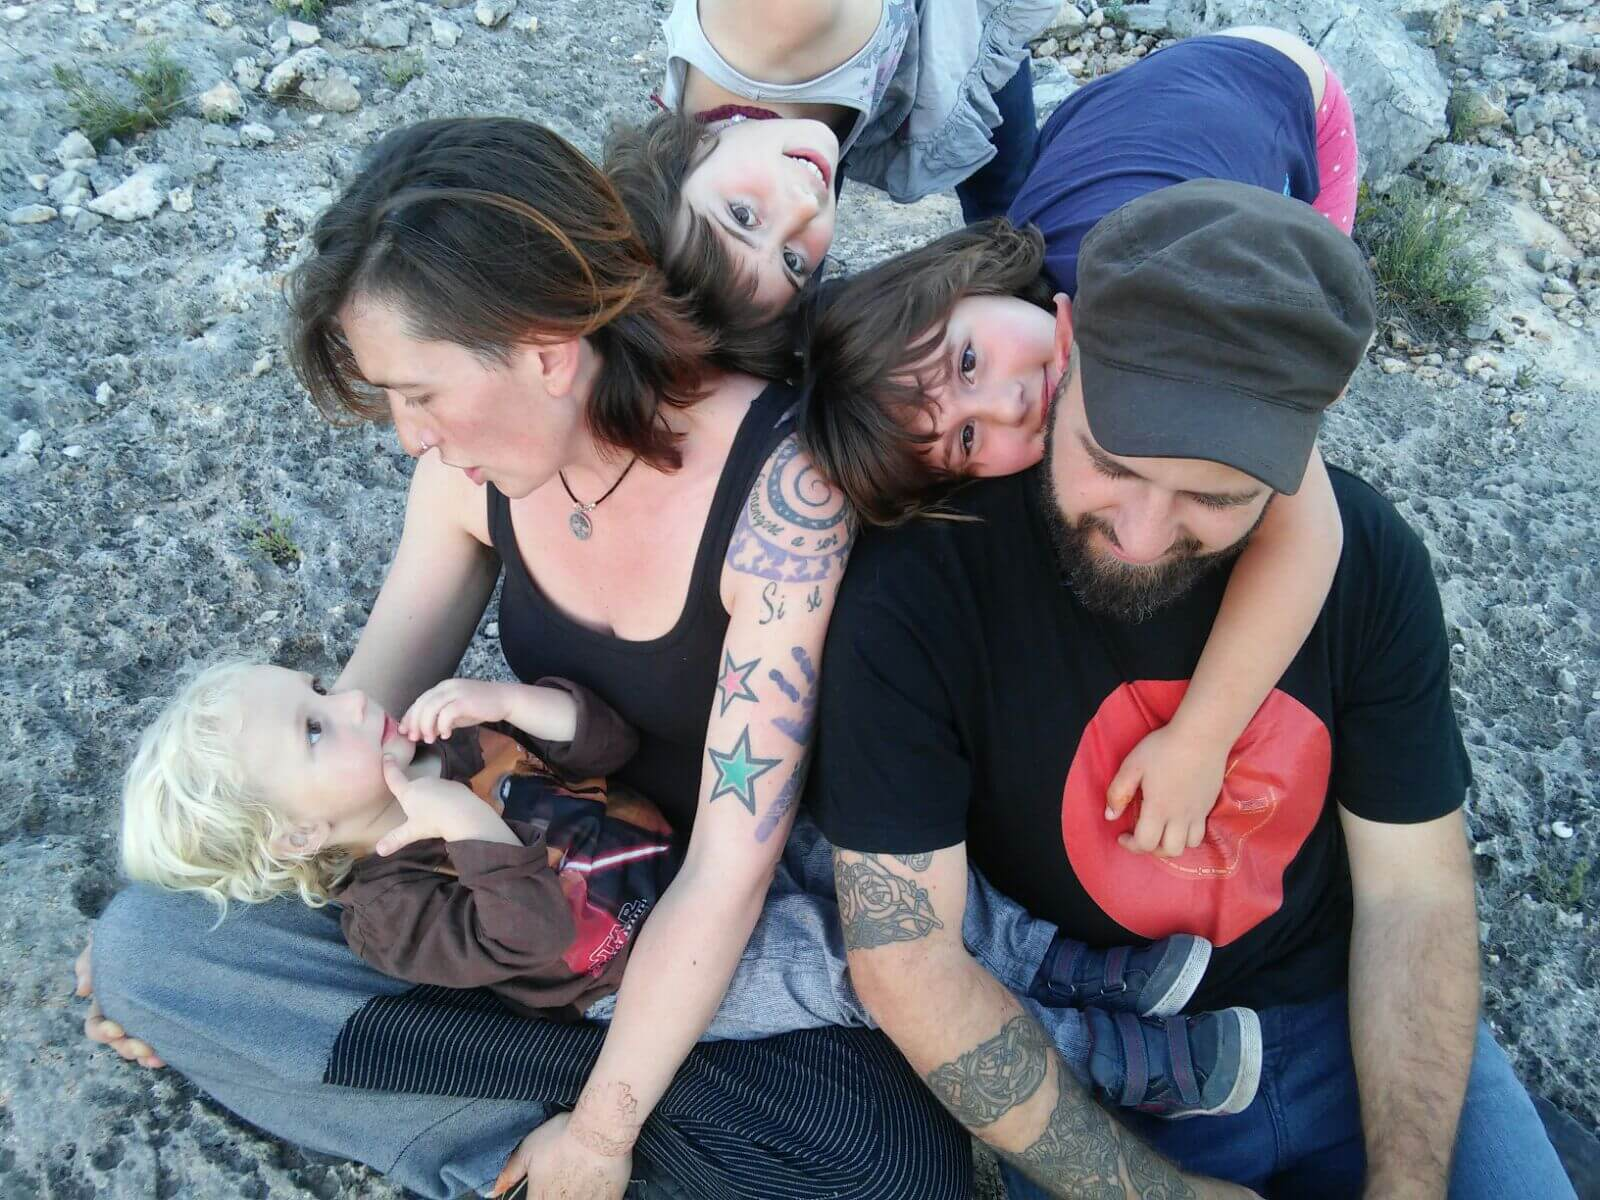 caracoles nomadas vivir viajando